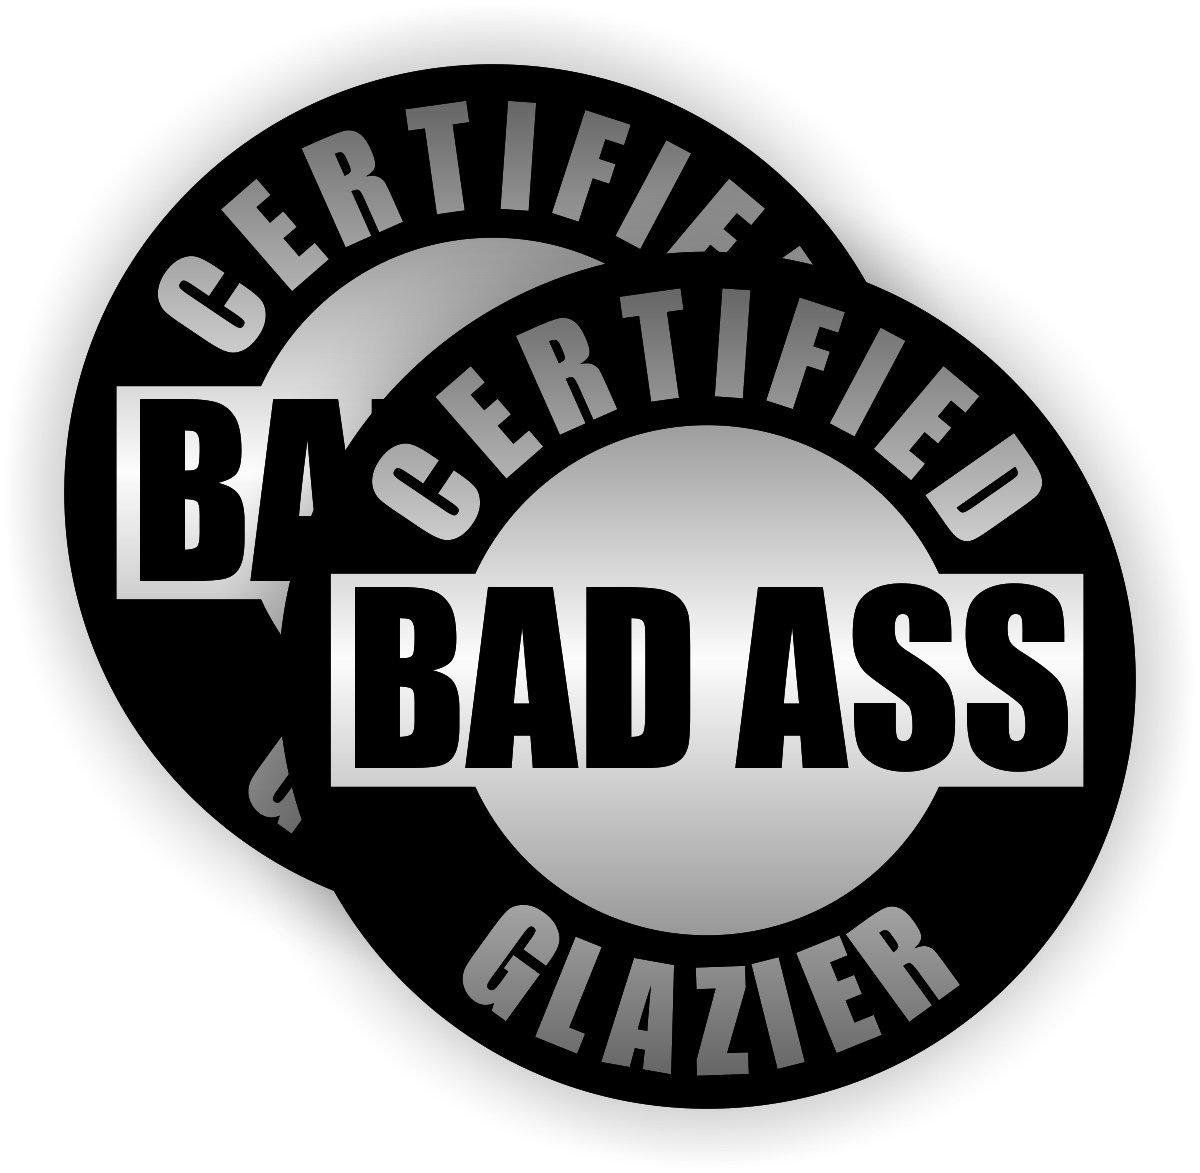 CERTIFIED BAD A$$ FORKLIFT DRIVER HELMET STICKER HARD HAT STICKER BLACK AND GREY